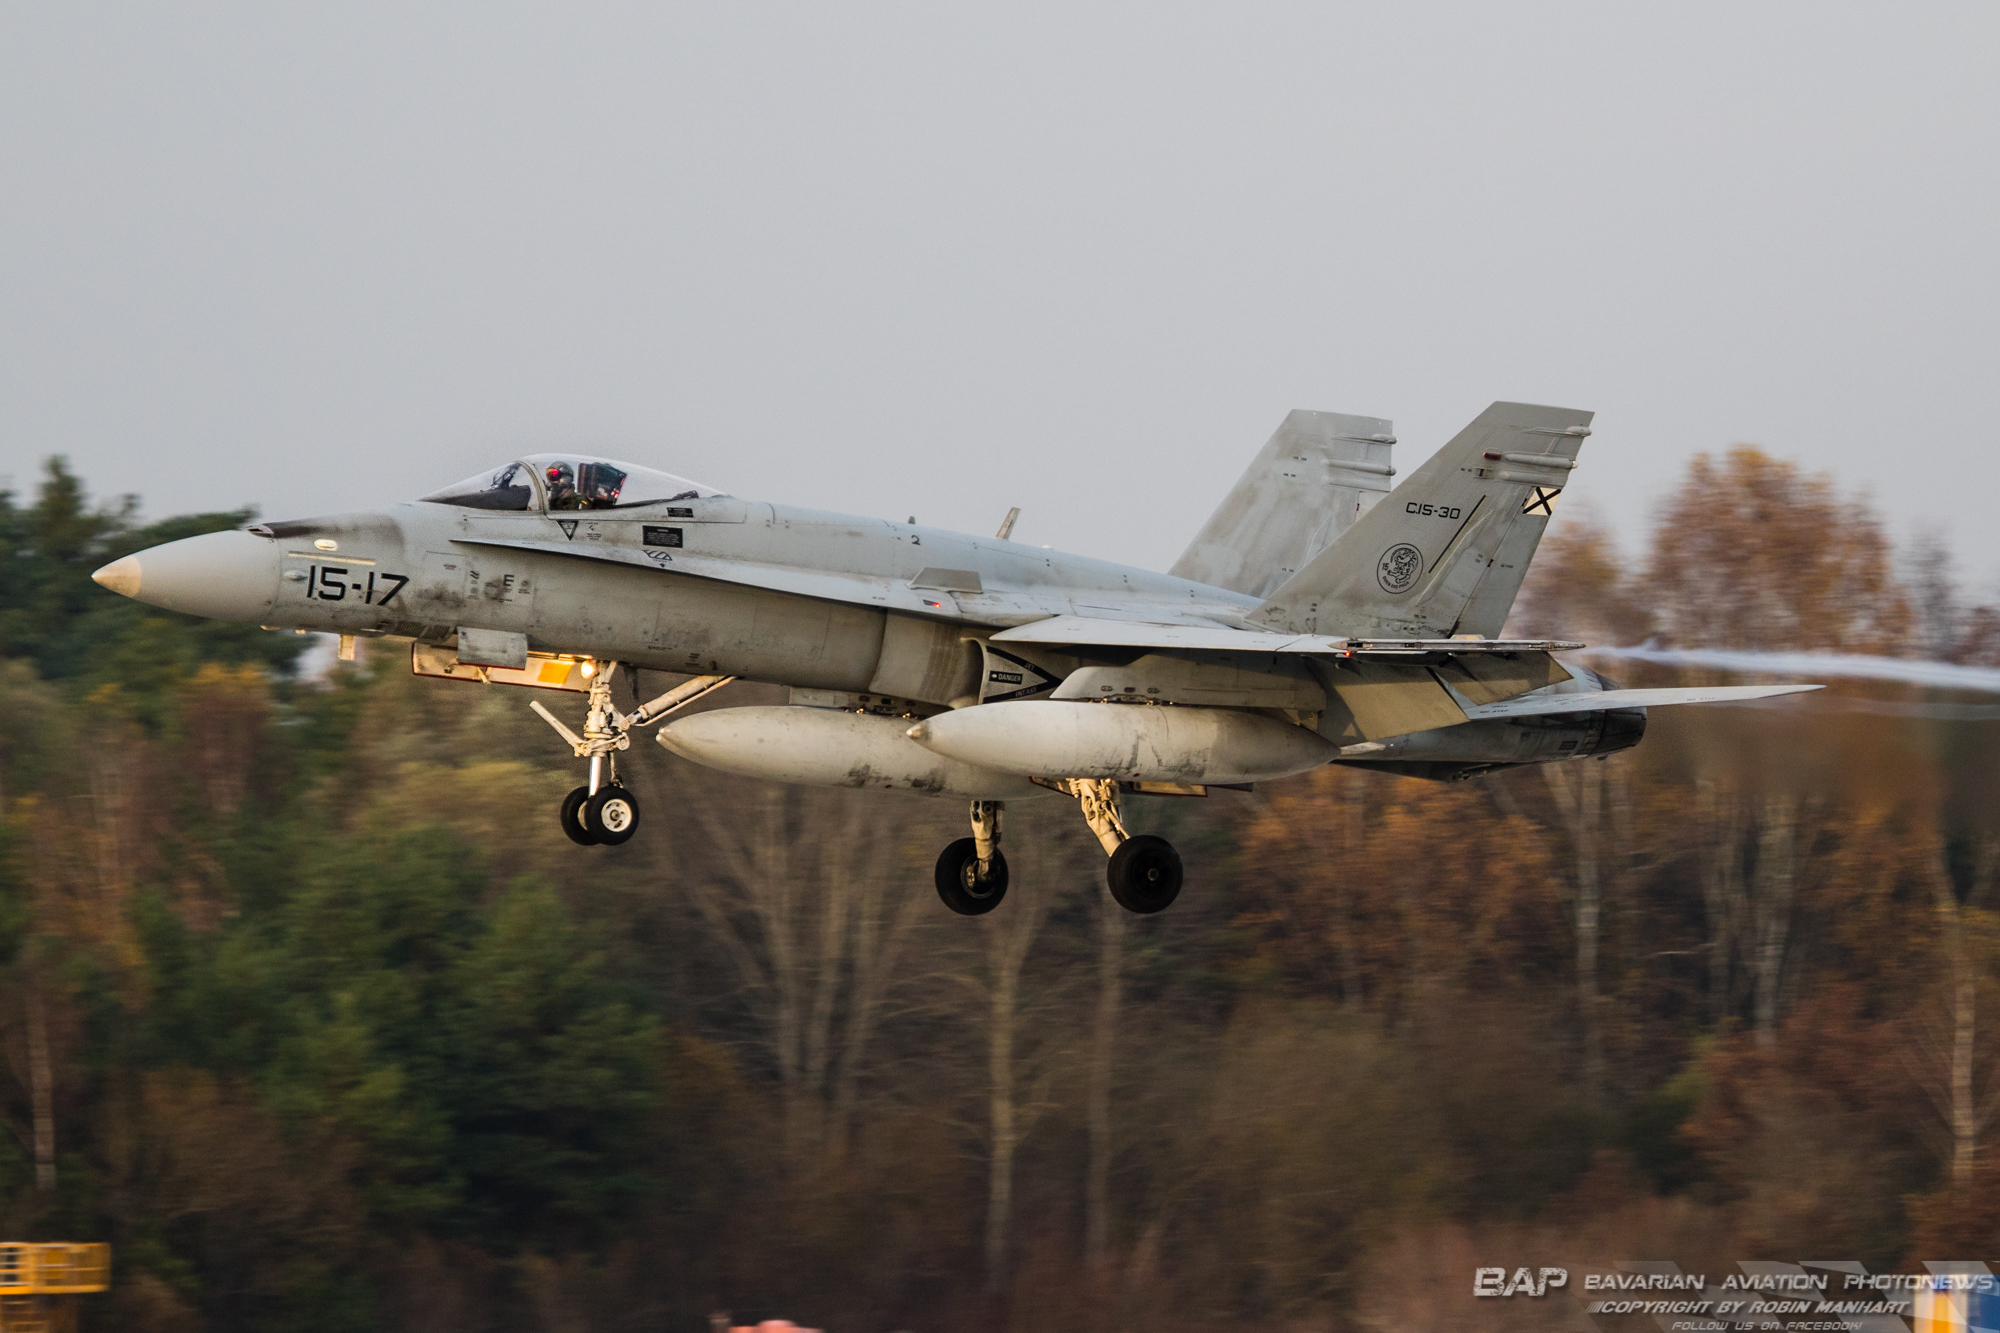 C.15-30/15-17 EF-18M ALA15 AME;